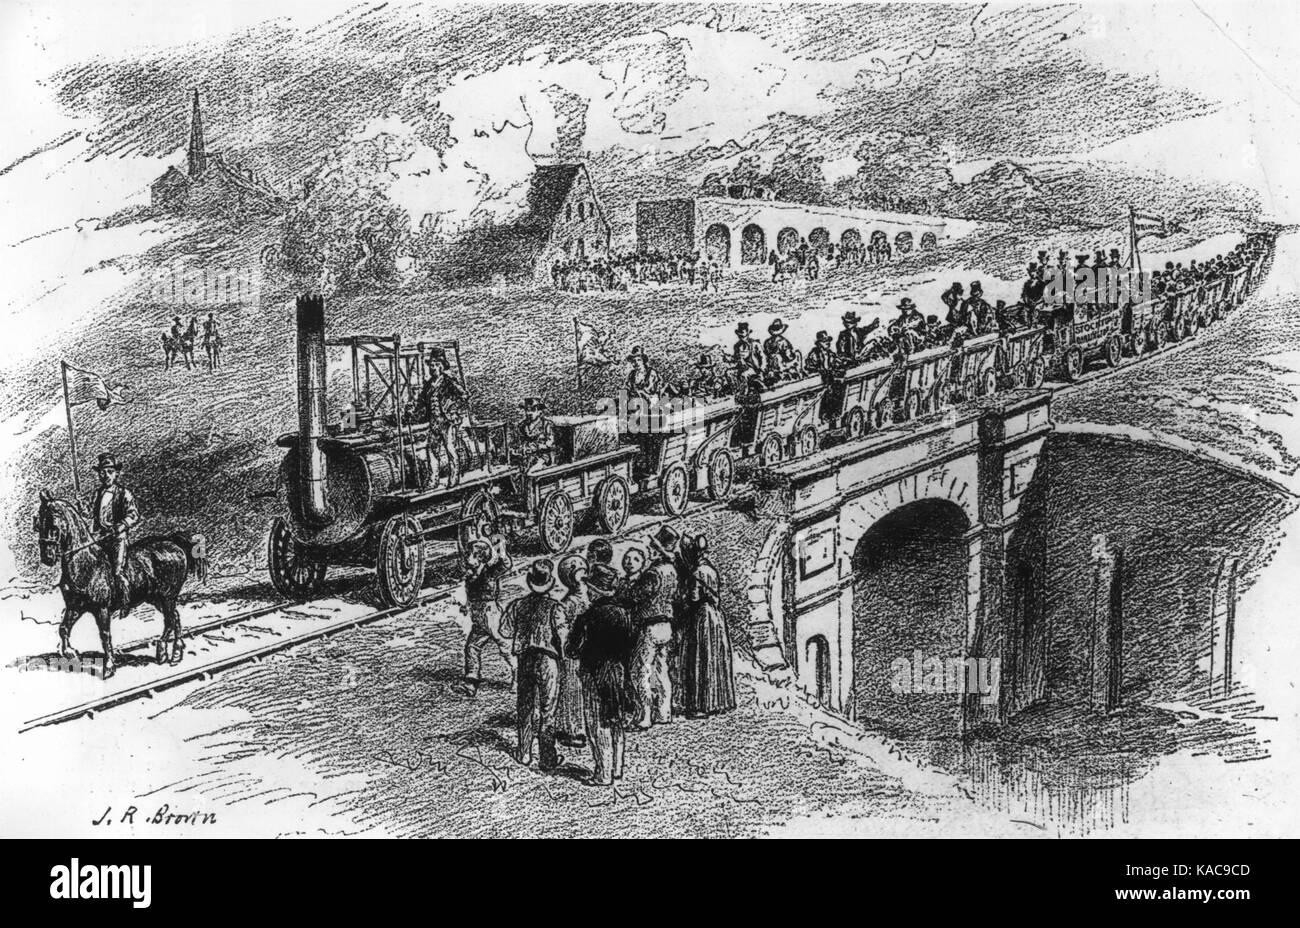 Stockton & Darlington Railway (Brown via Getty Images) - Stock Image